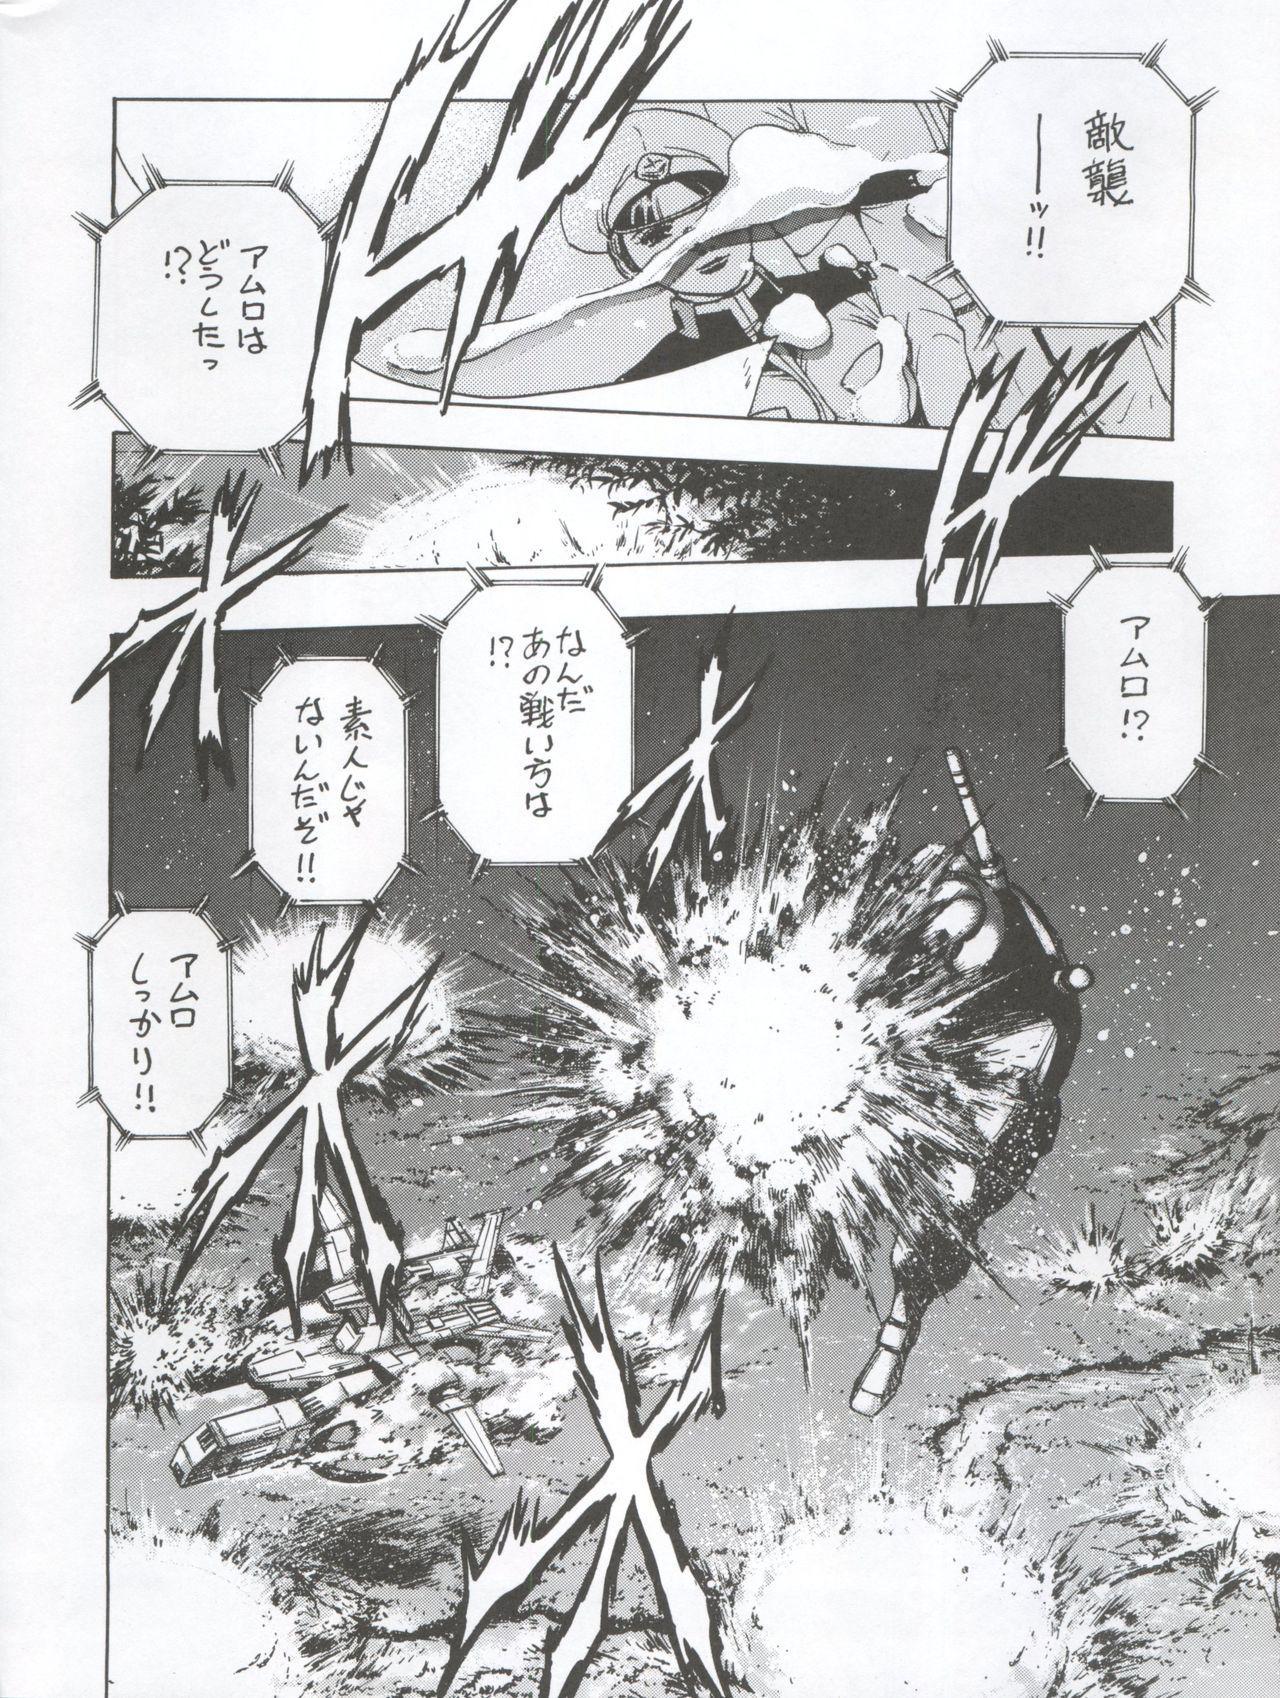 NEXT Climax Magazine 3 Gundam Series 9